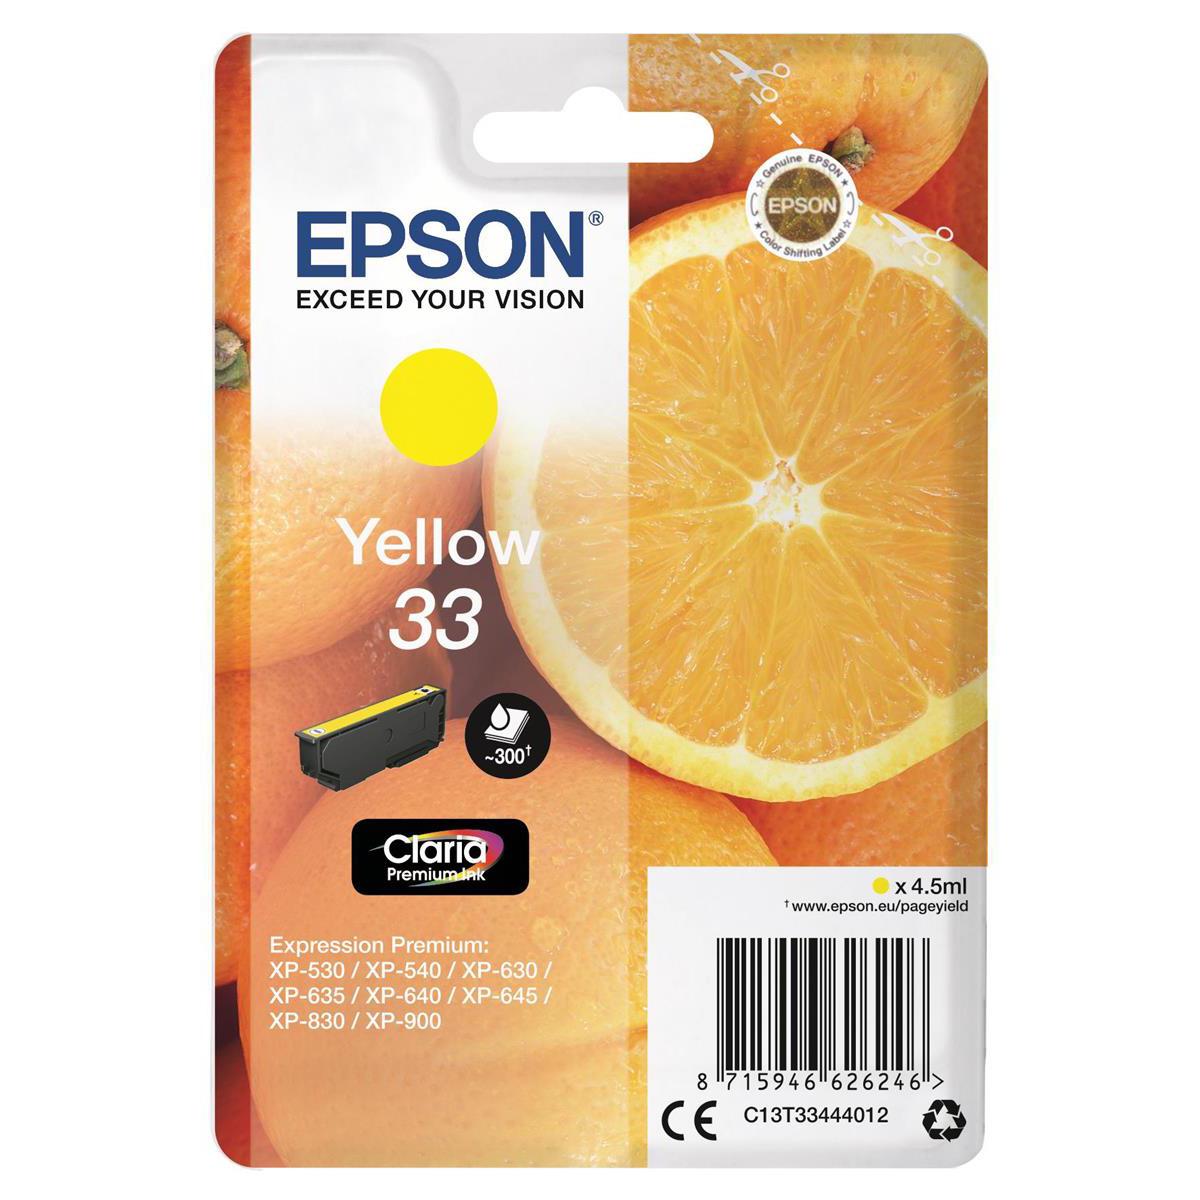 Epson T33 Inkjet Cartridge Orange Page Life 300pp 4.5ml Yellow Ref C13T33444012